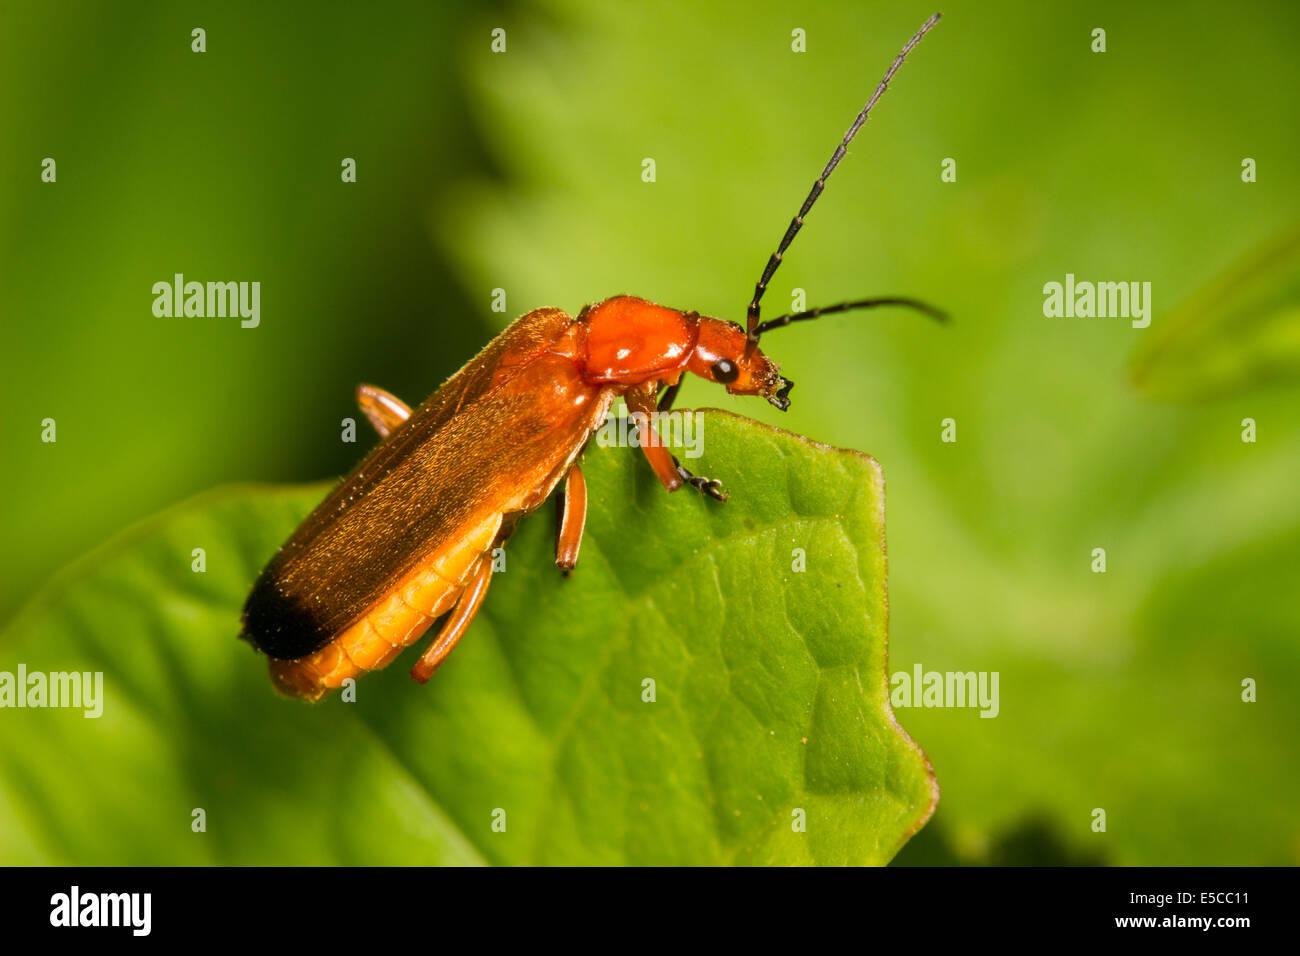 Orange soldier beetle, Rhagonycha fulva Stock Photo